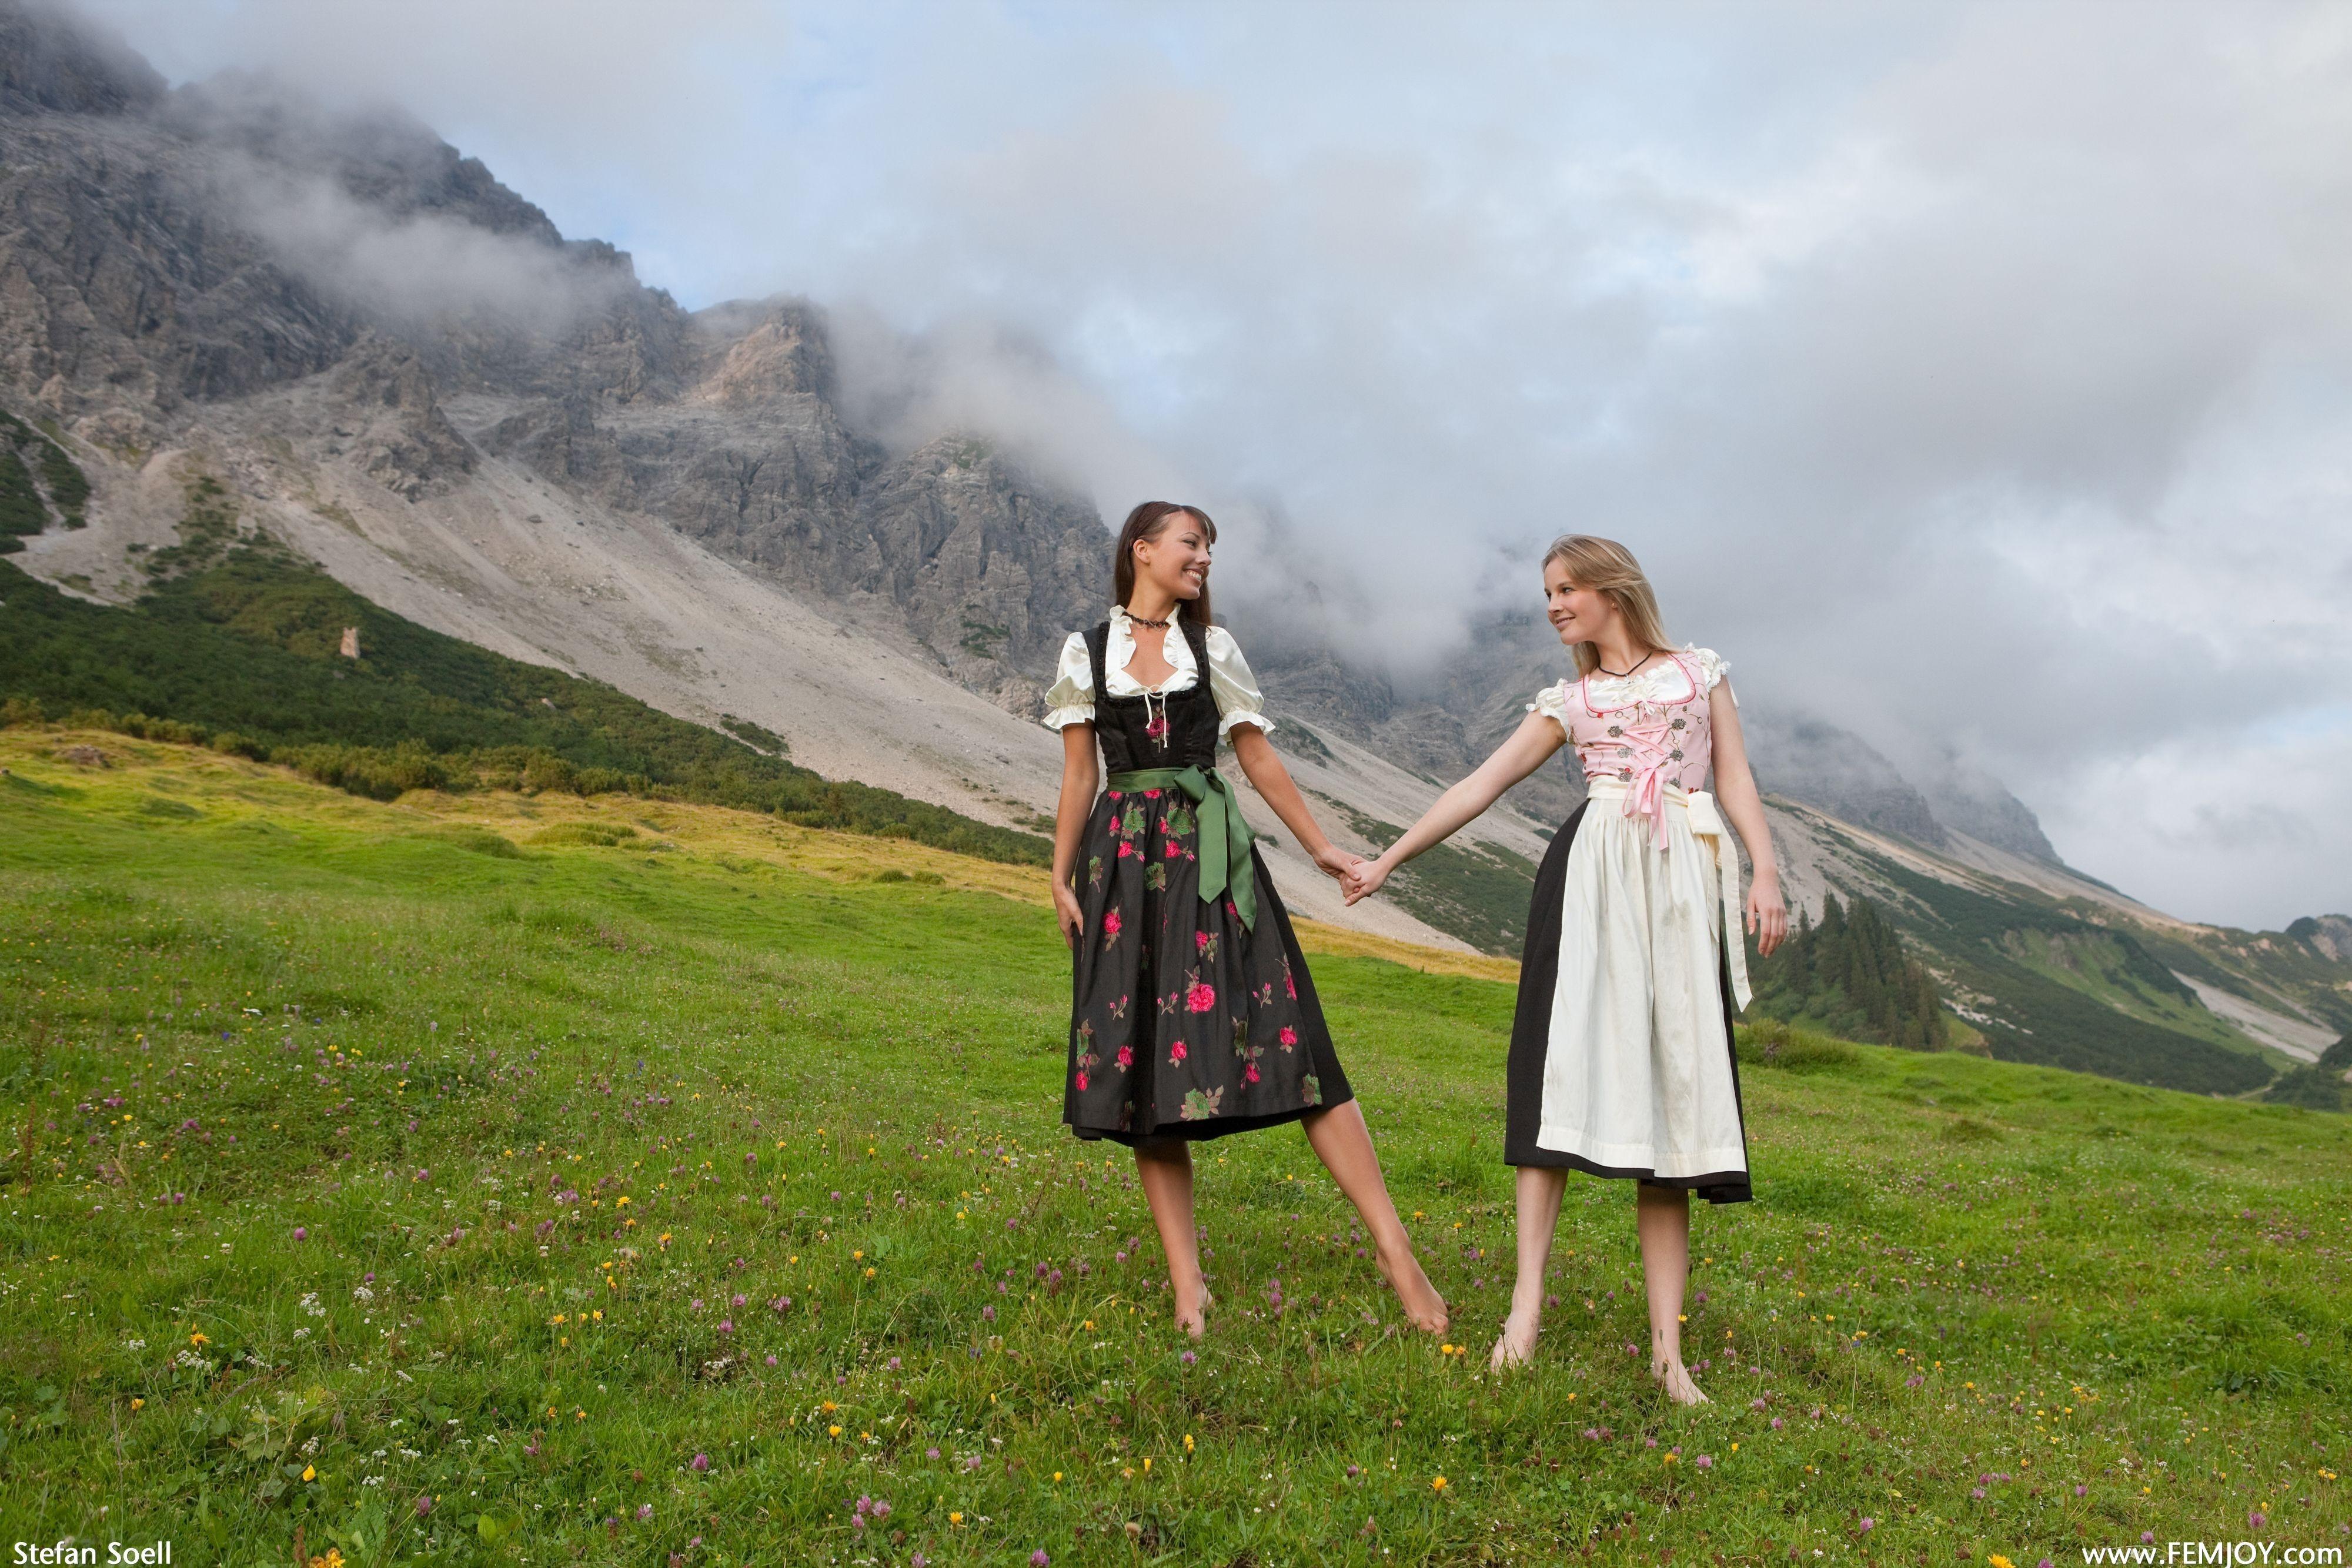 Barefoot bavaria scenic smiling